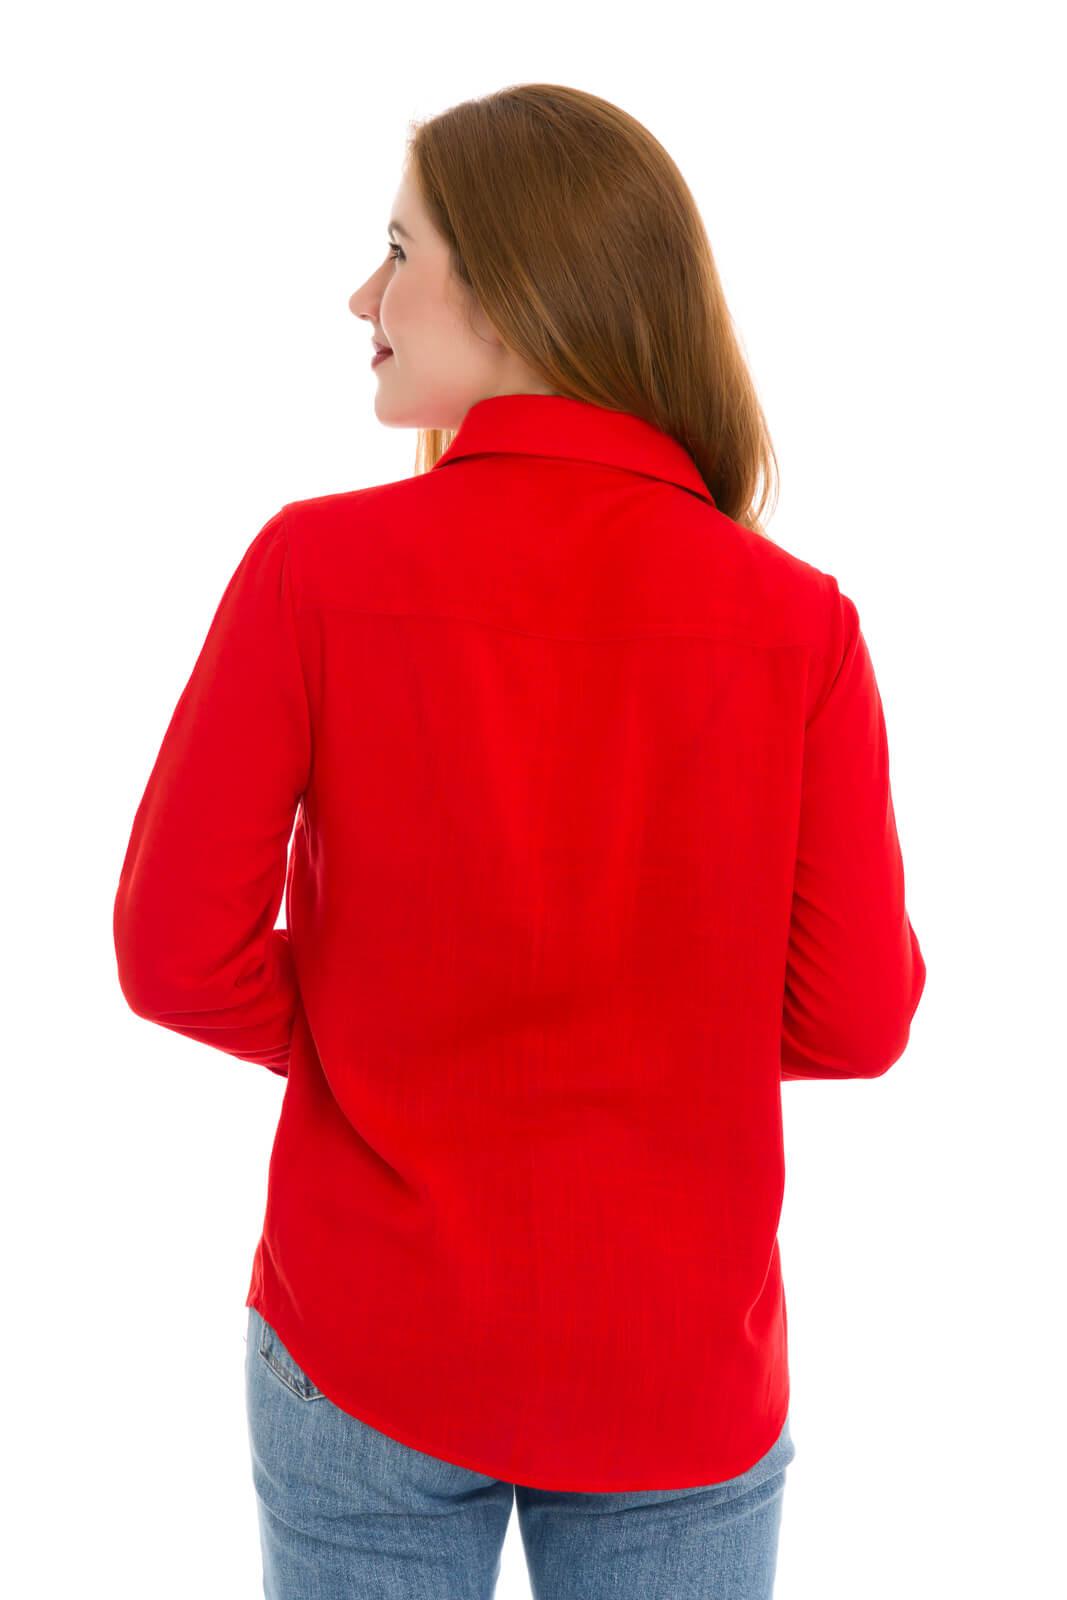 Camisa Feminina Olimpo Viscose Lisa com Bolsos Vermelha Manga Longa